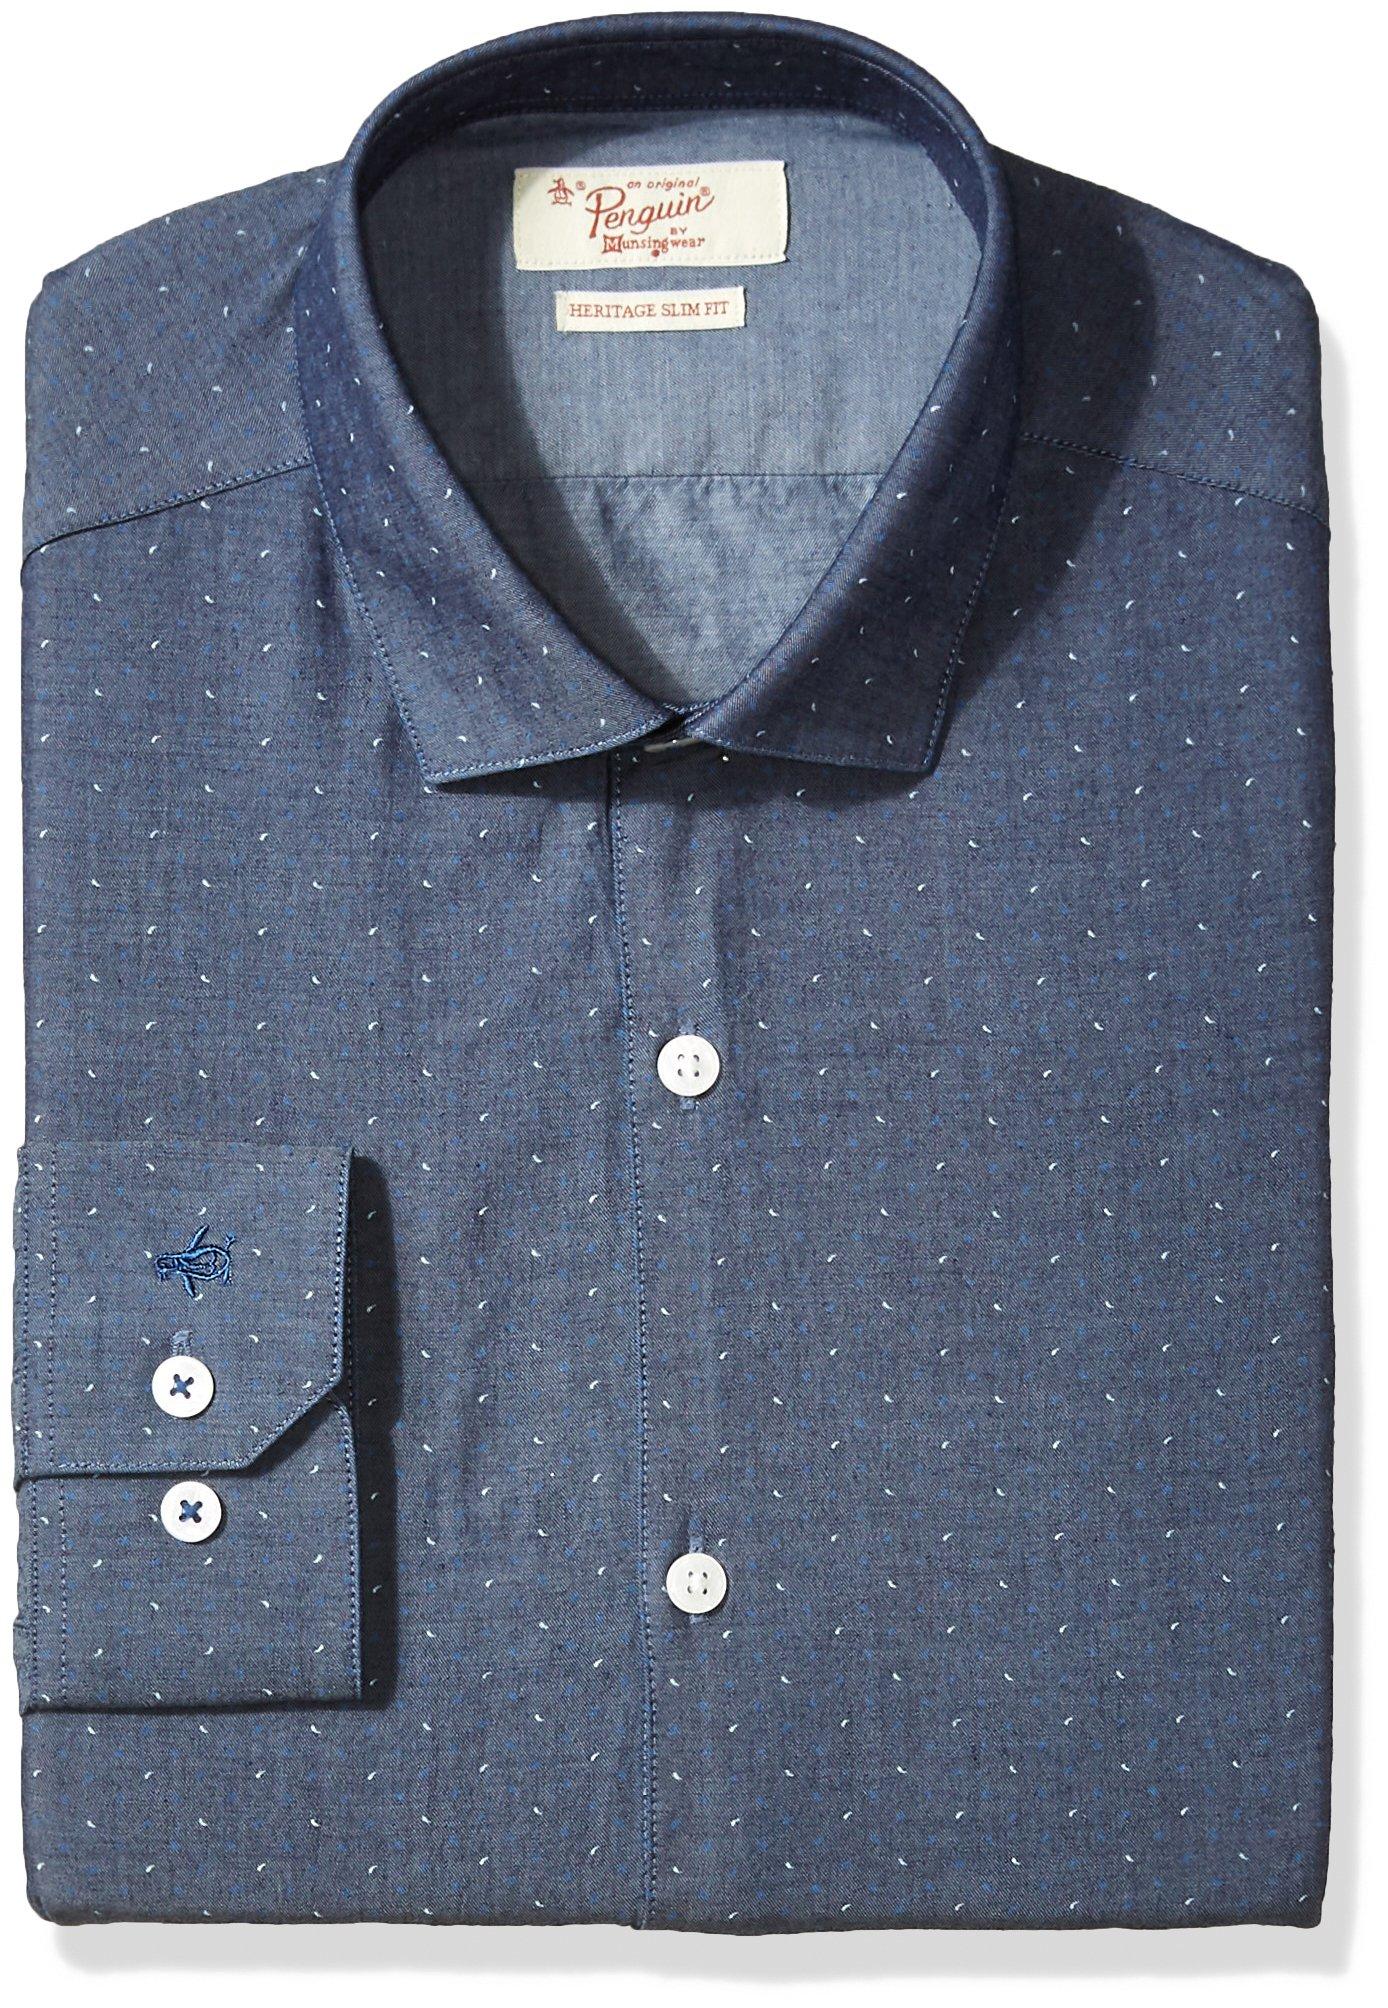 Original Penguin Men's Slim Fit Performance Spread Collar Printed Dress Shirt, Indigo, 17 32/33